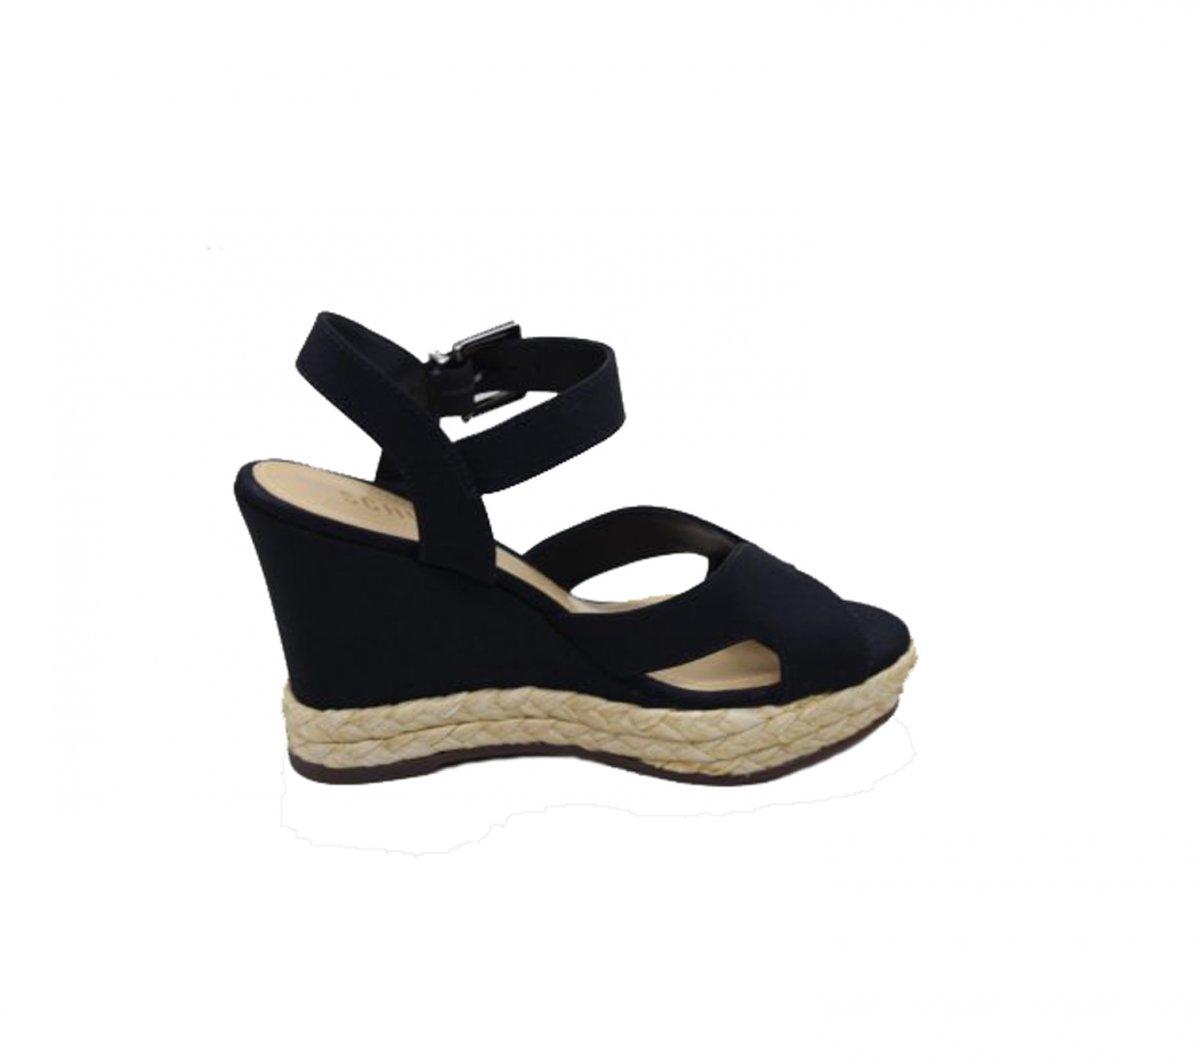 2a0aec244 Sandalia Anabela Leather Black Schutz | G&Co Shoes